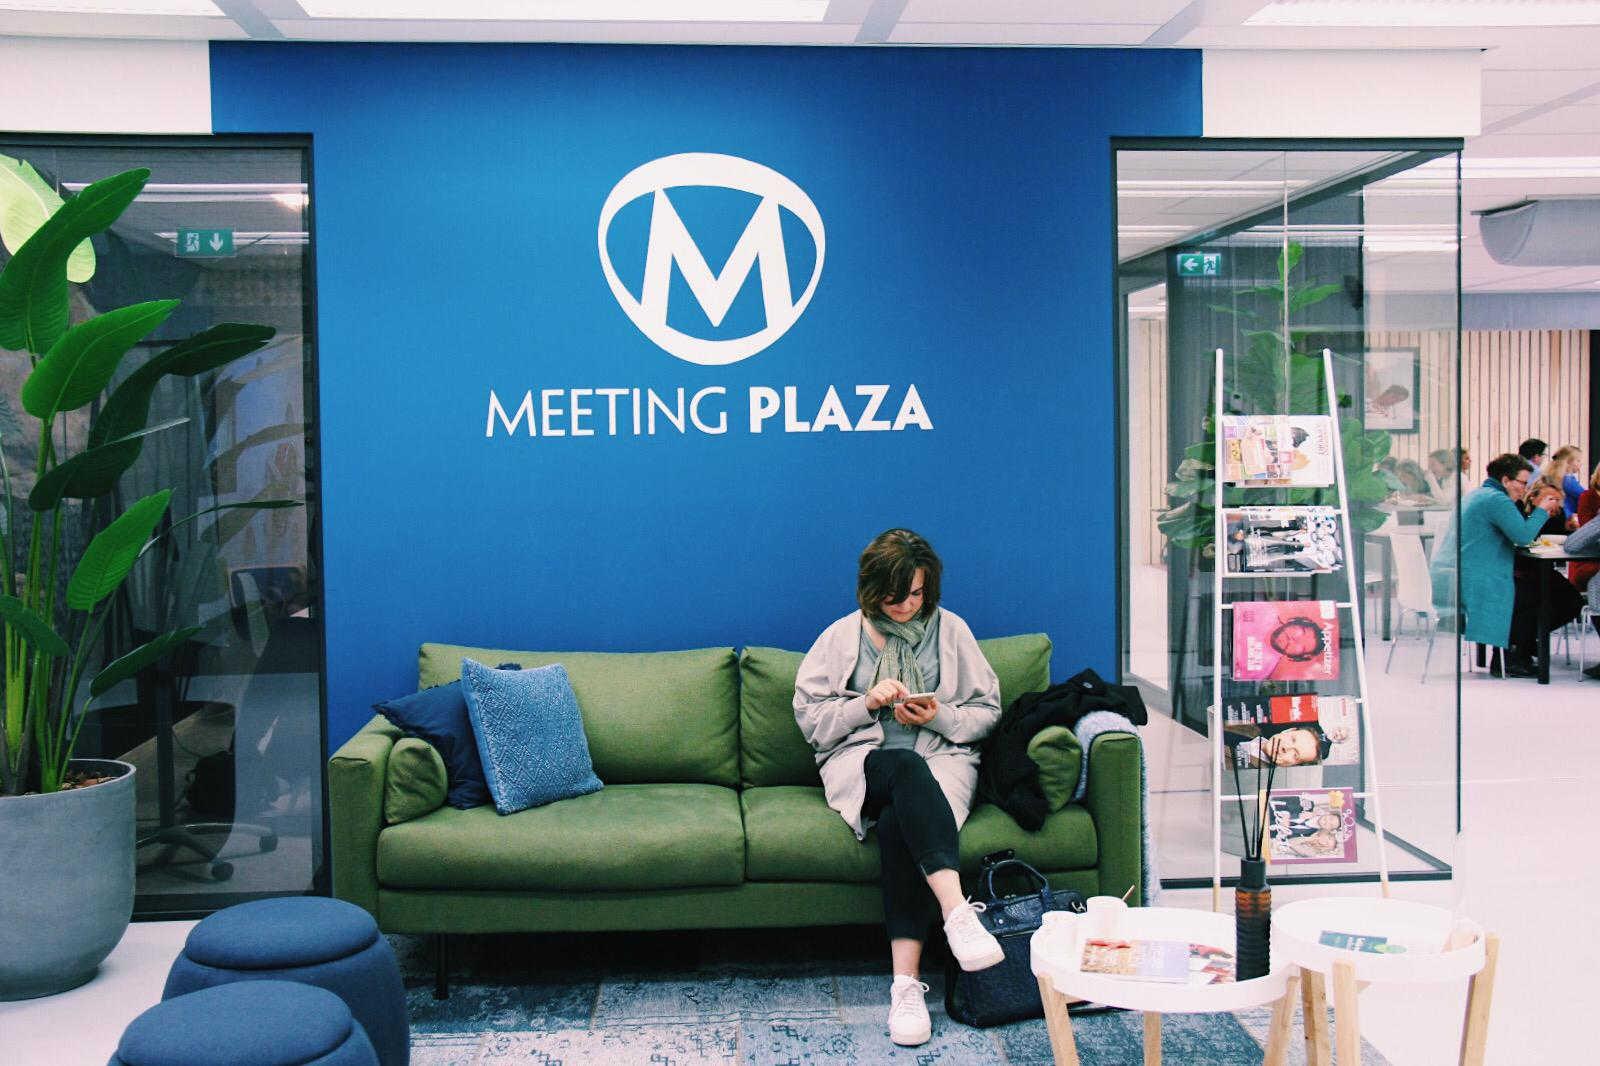 Meeting Plaza